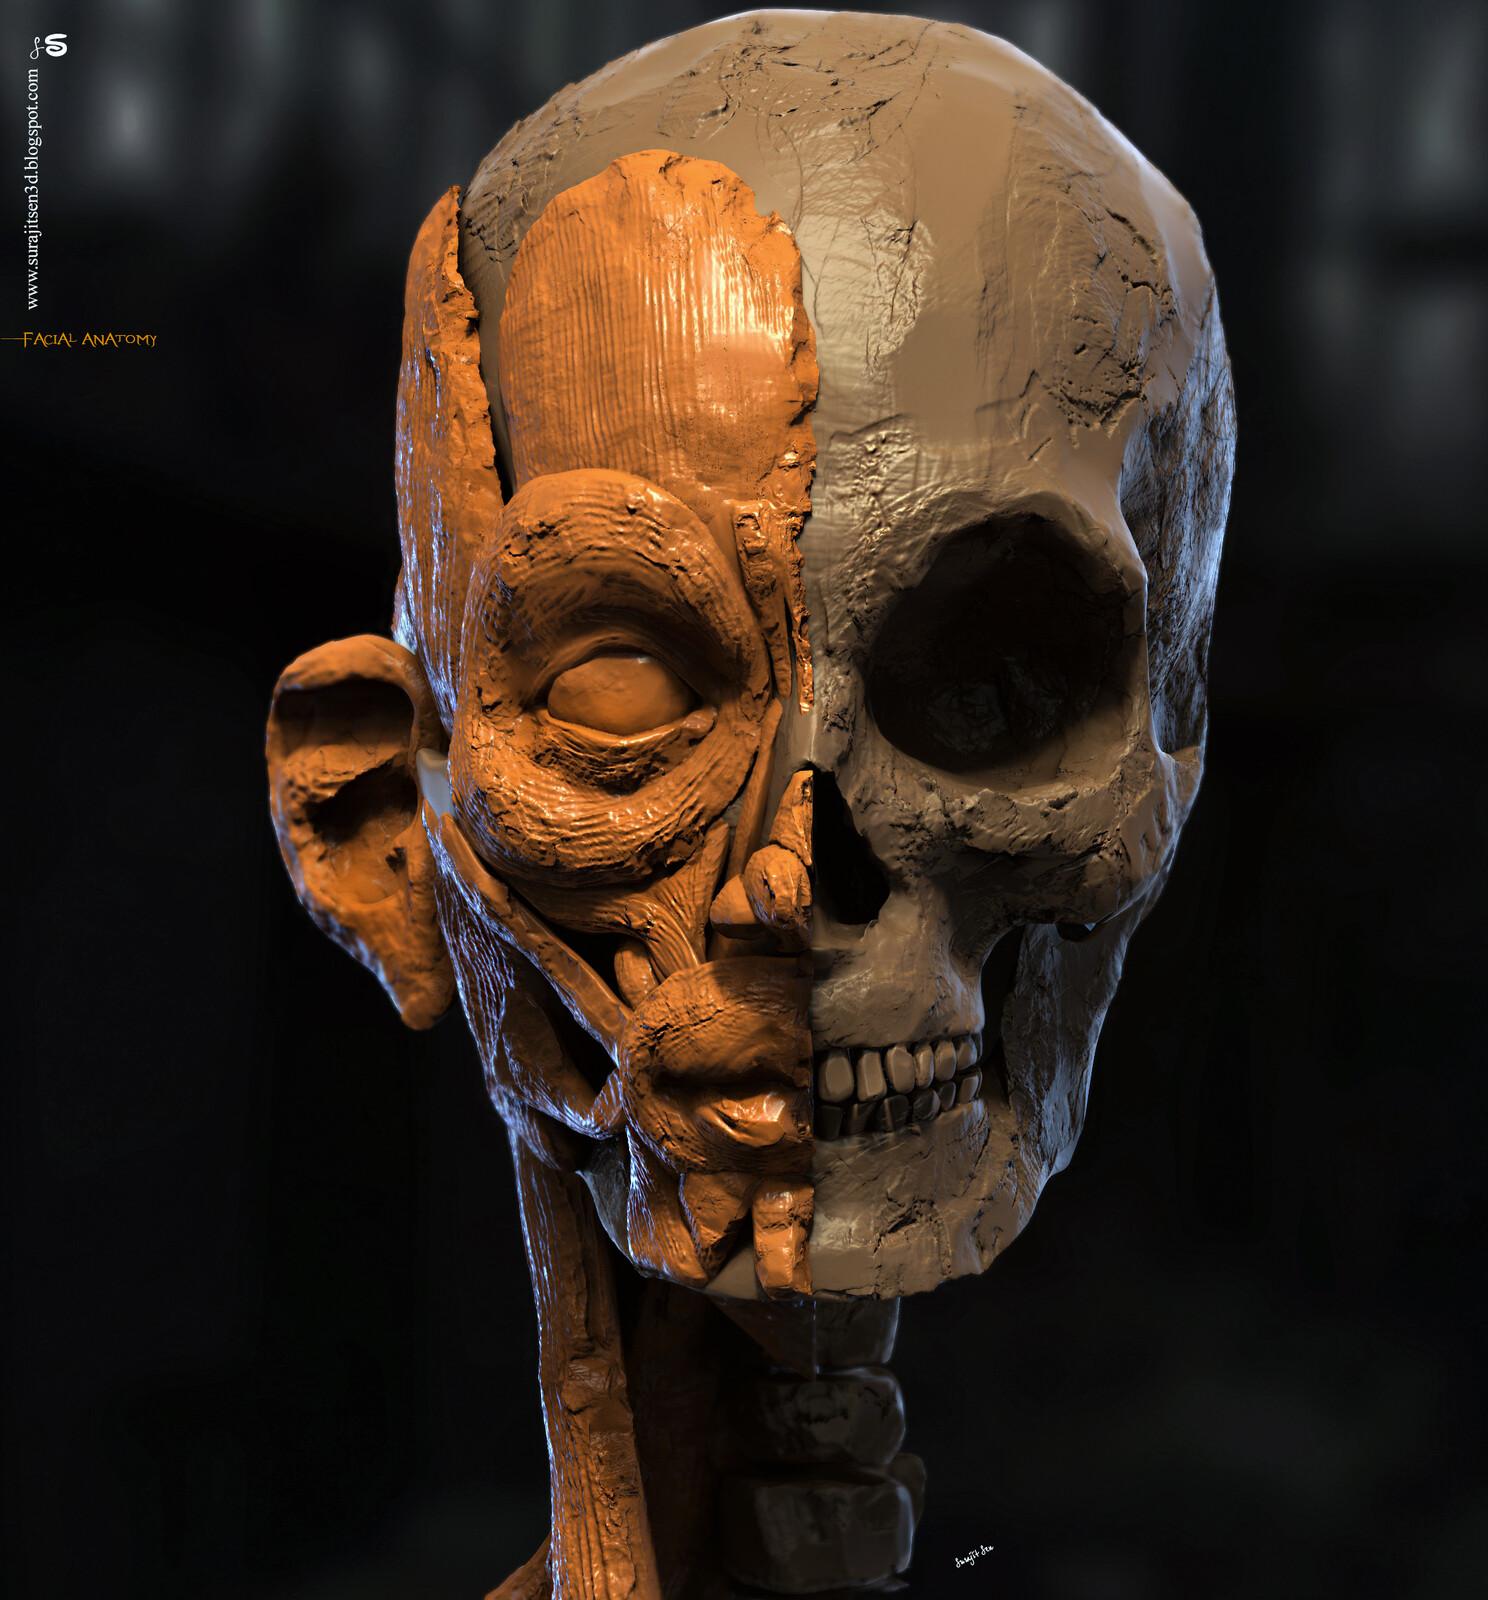 Human Facial Anatomy Digital Sculpture Basic Blocking My weekend study work. Background music- #hanszimmermusic